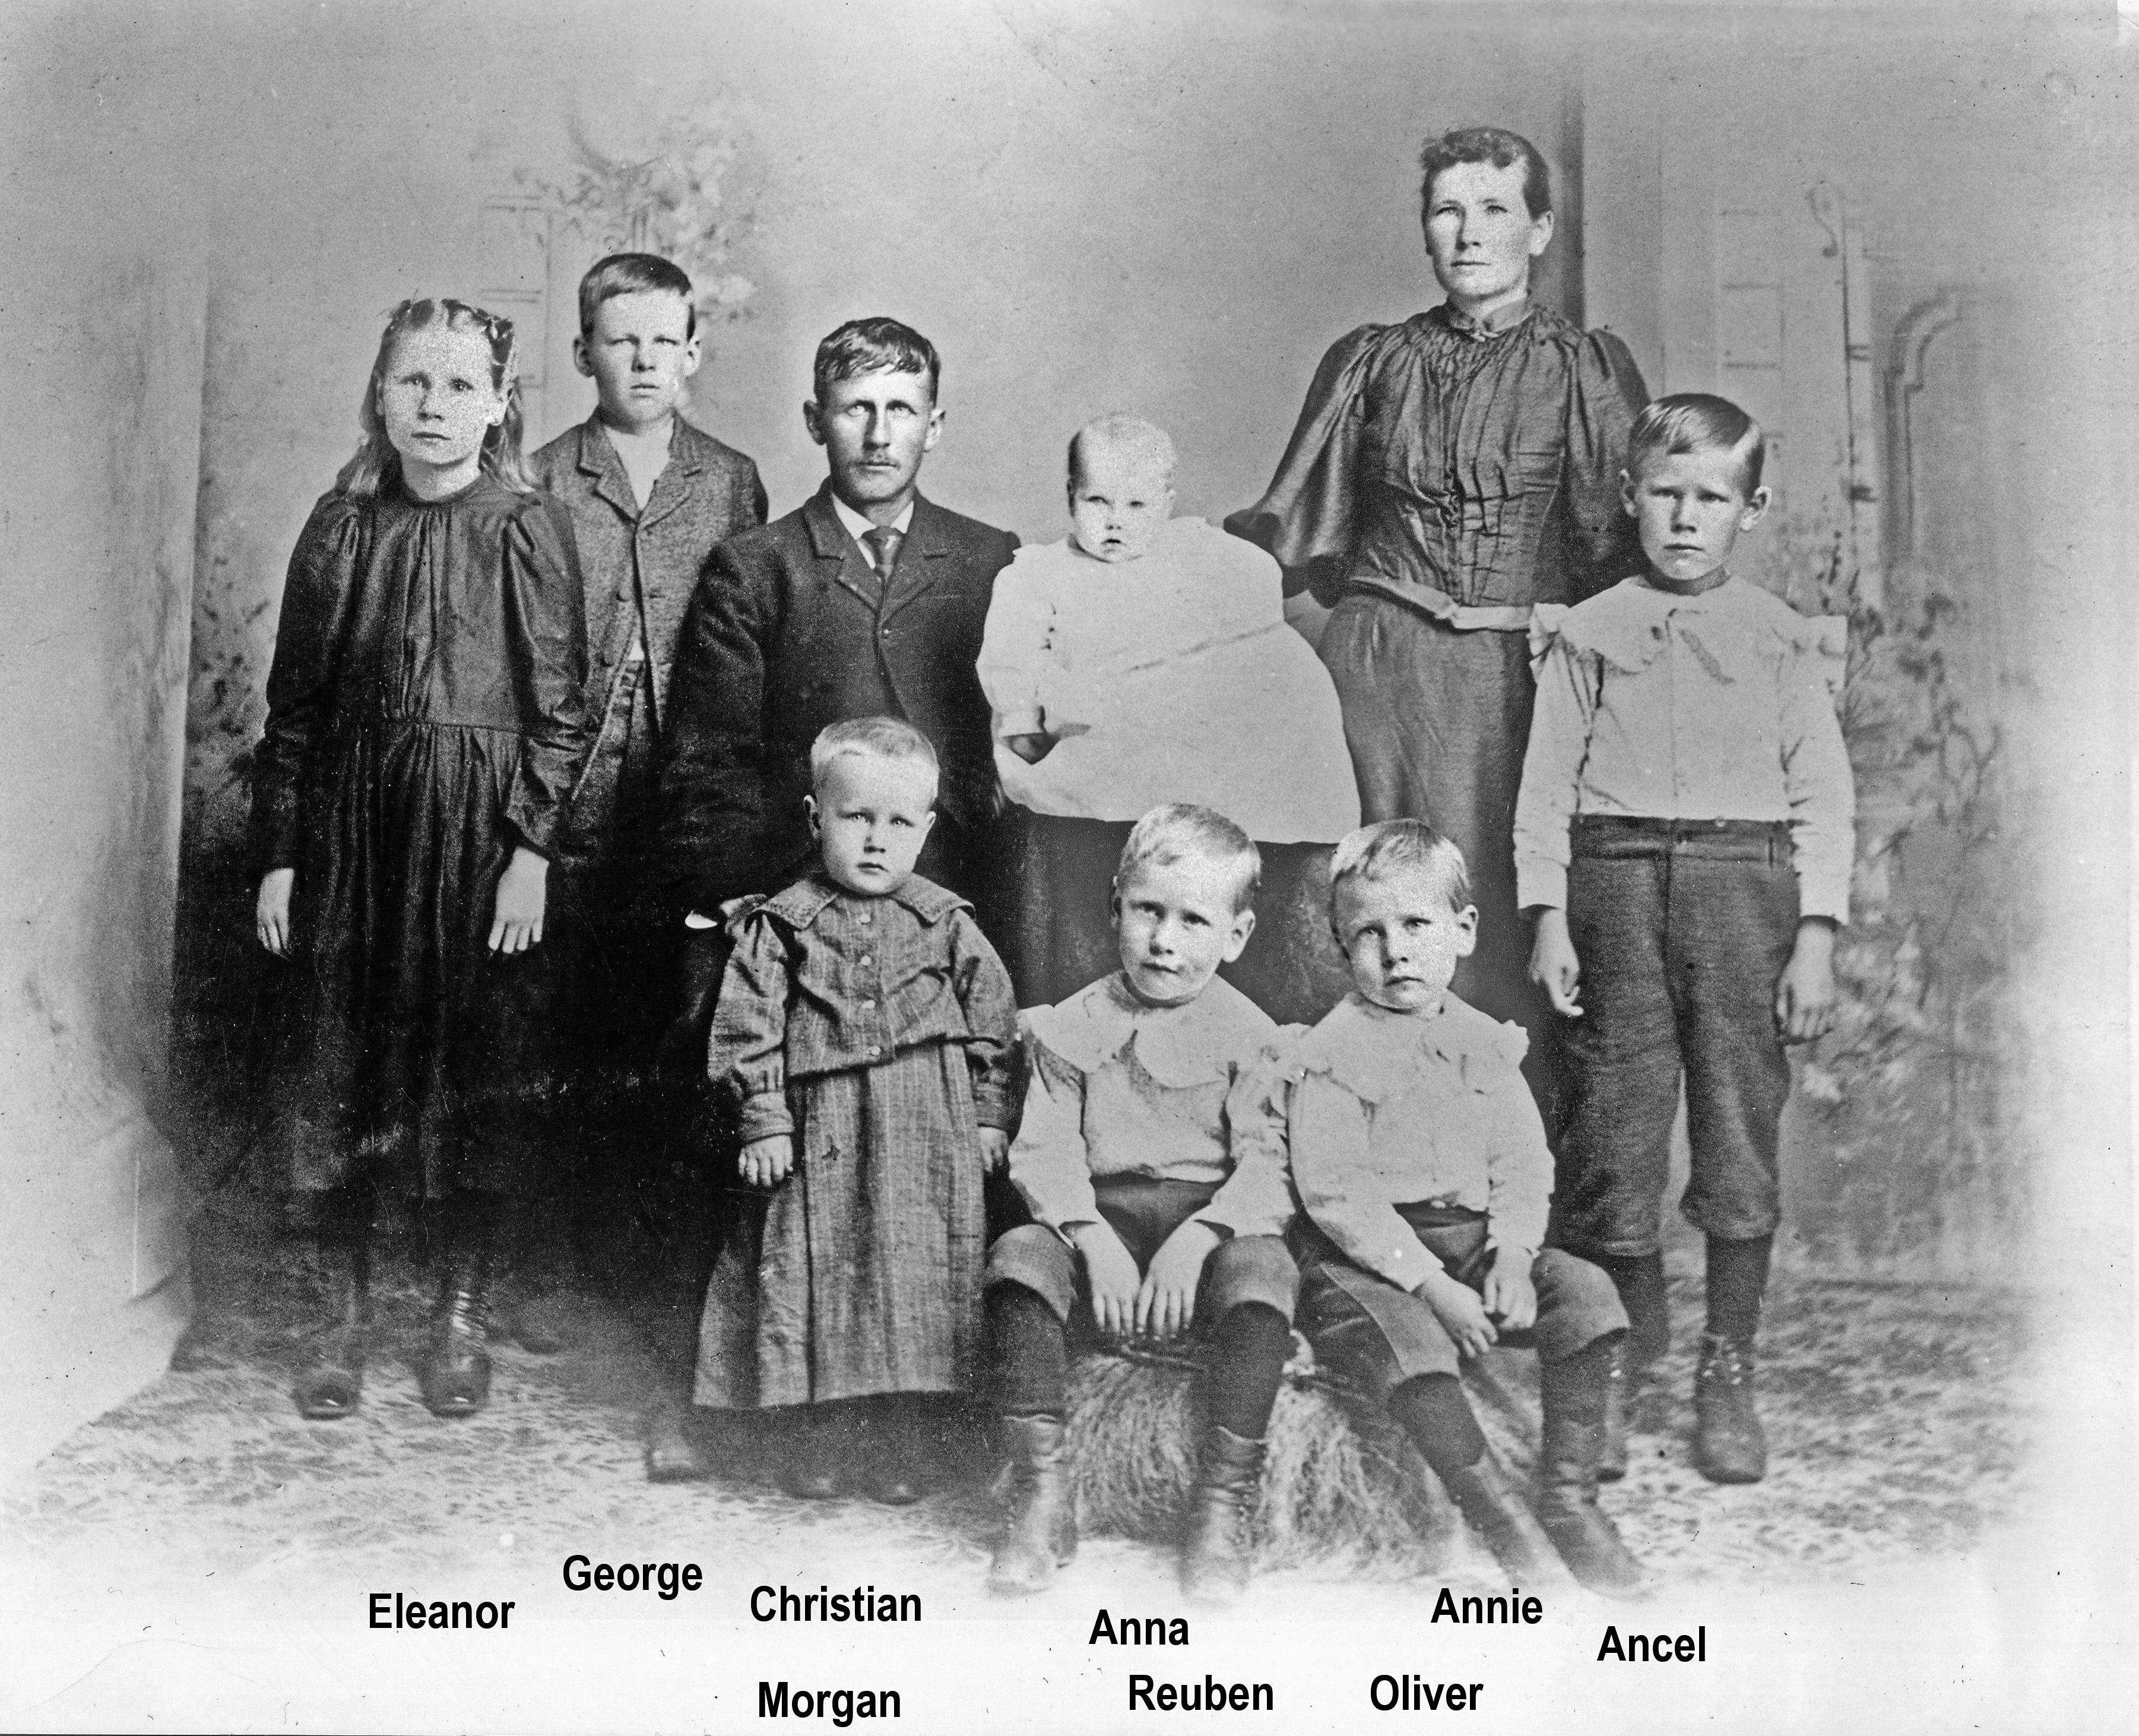 1901 Eleanor, George, Christian, Morgan, Anna, Reuben, Oliver, Annie, Ancel OH16-2 P68m Christian, Anna, Children